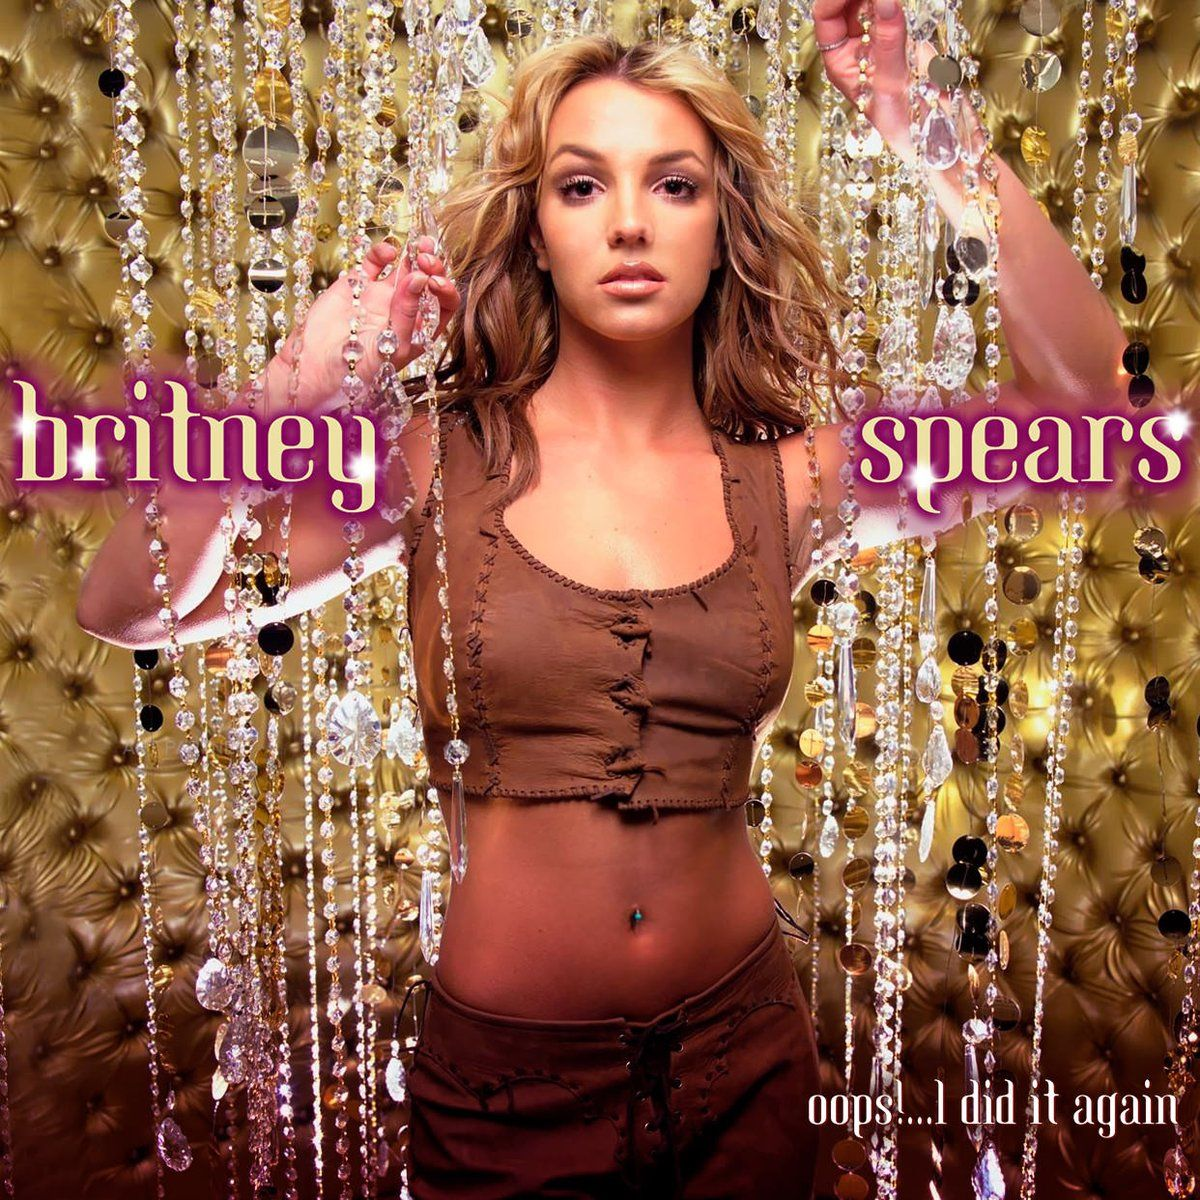 Britney Spears celebra los 20 años de Oops... I Did It Again